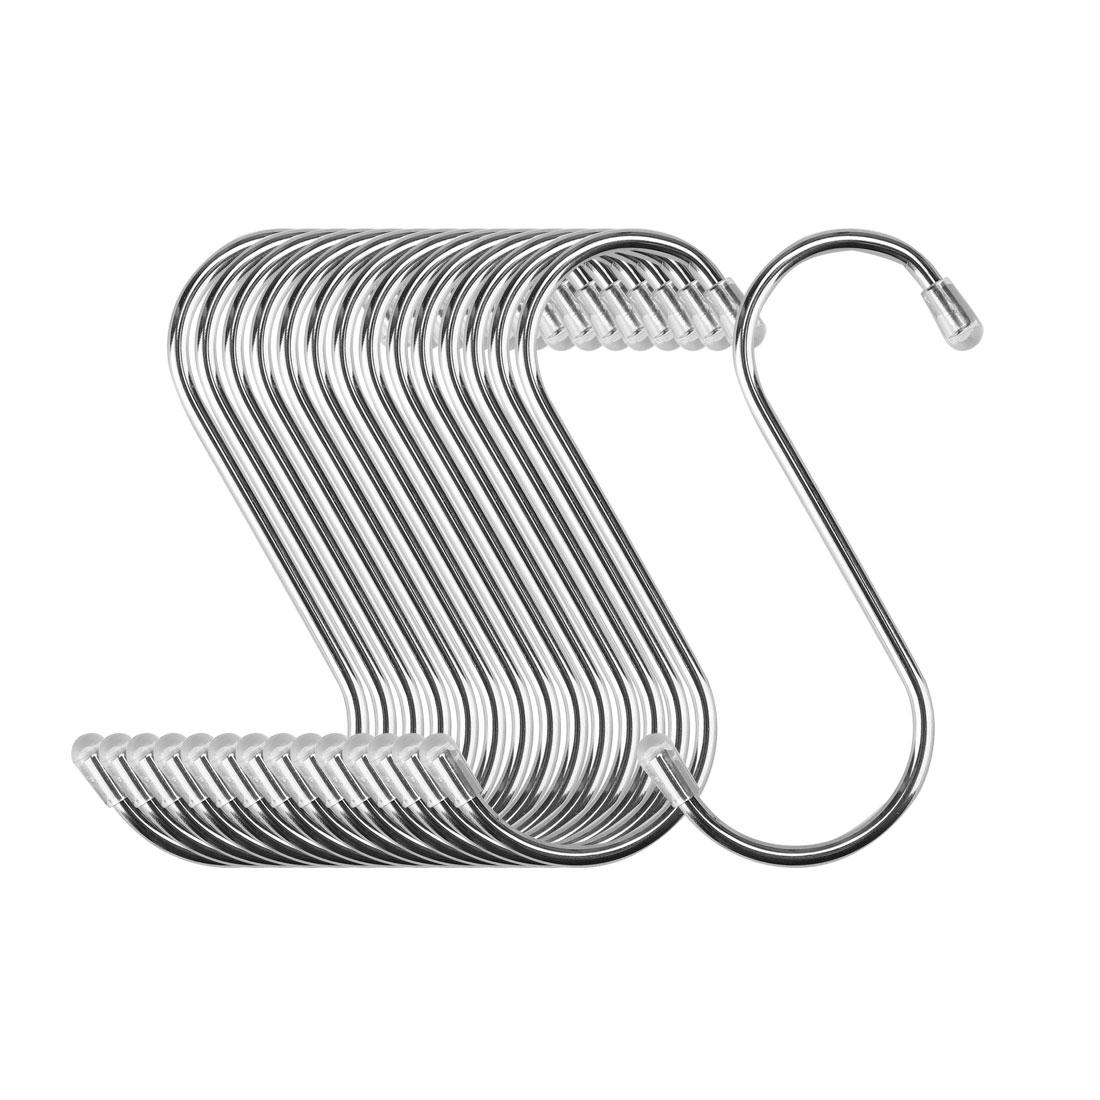 S Shape Hook Rack Stainless Steel for Kitchenware Coat Towels Holder 15 Pack